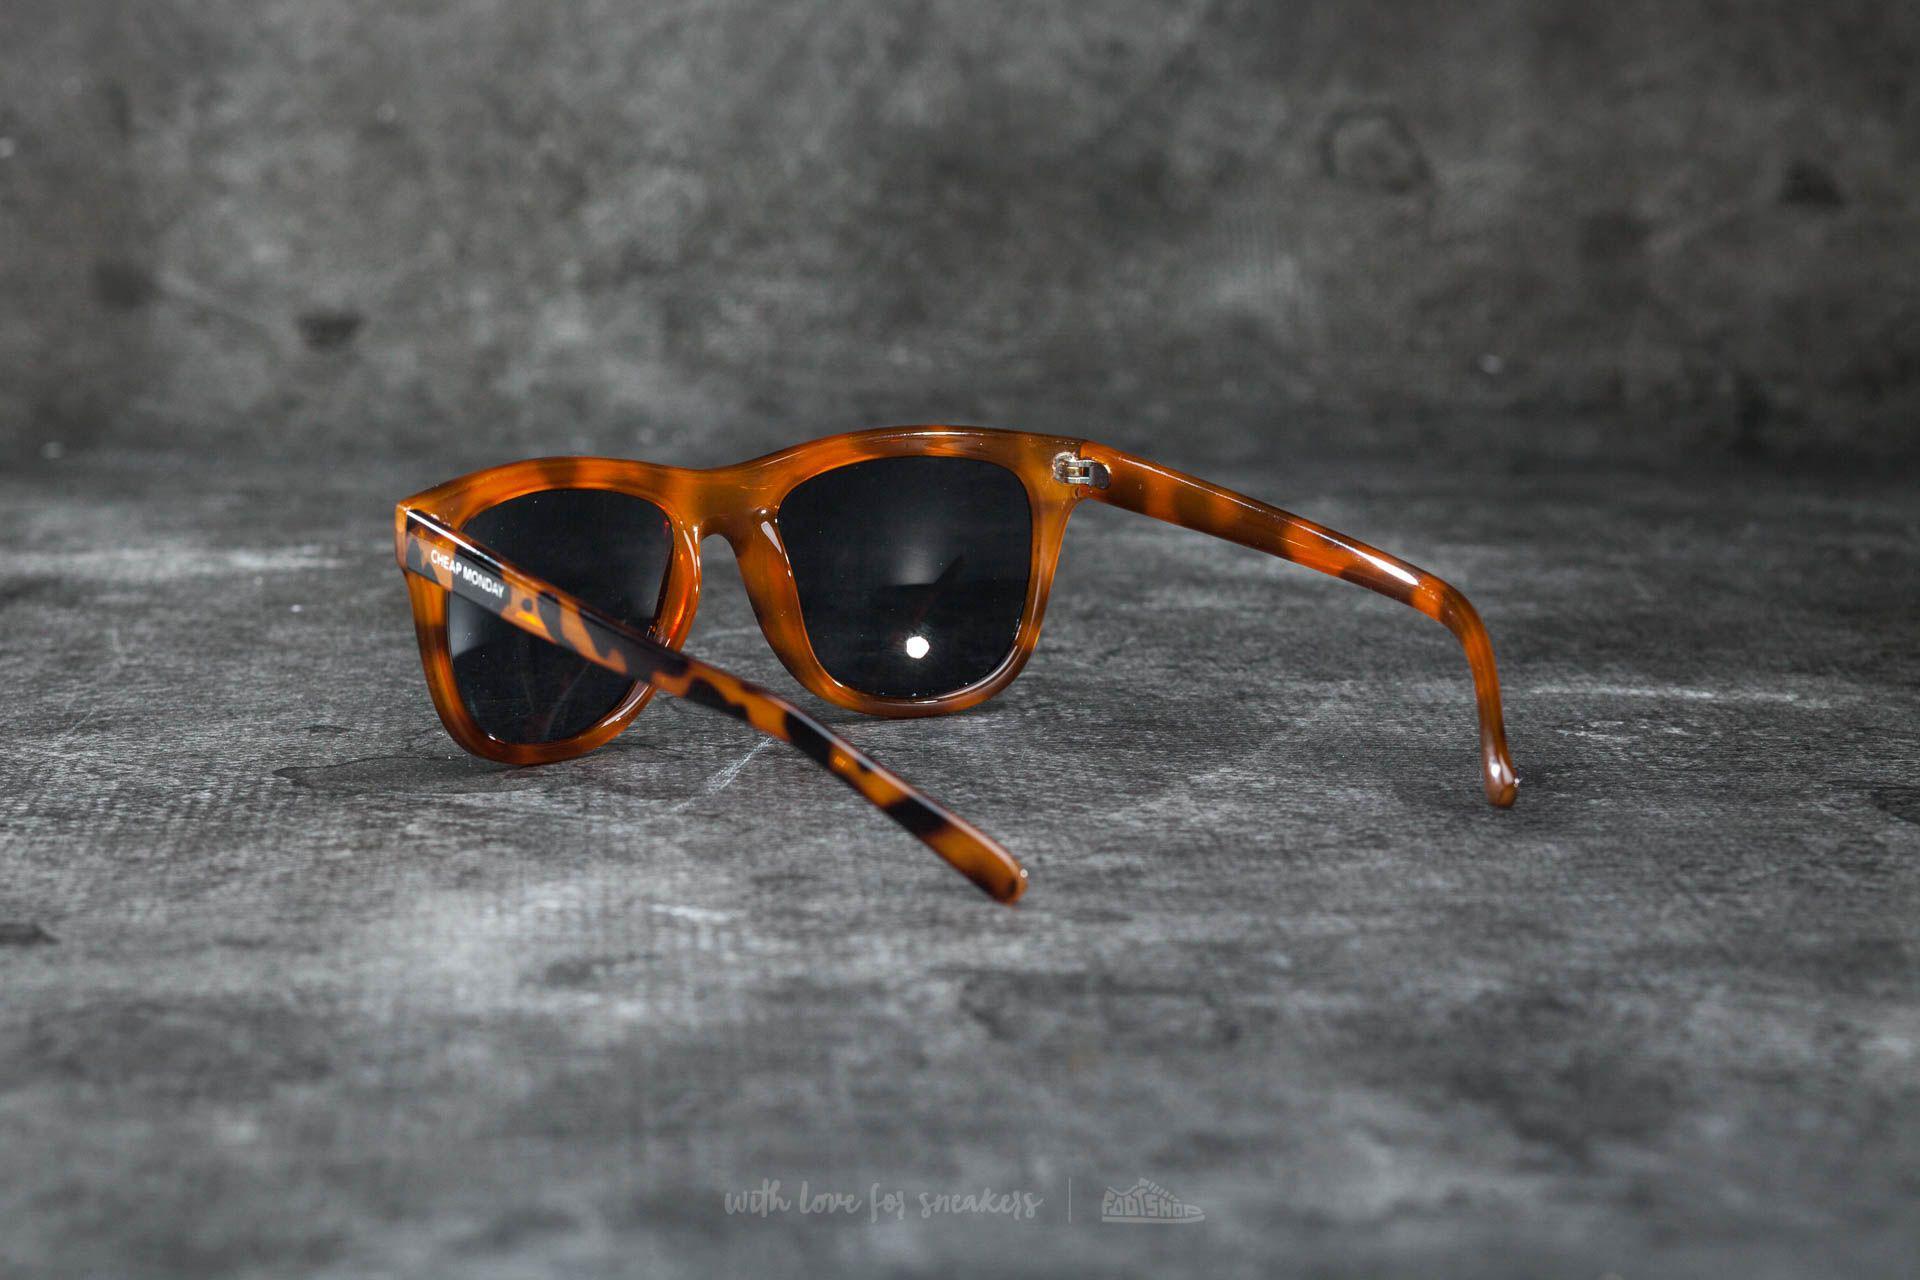 f29e6ace842 Lyst - Footshop Cheap Monday Timeless Sunglasses Prison Turtle Brown ...